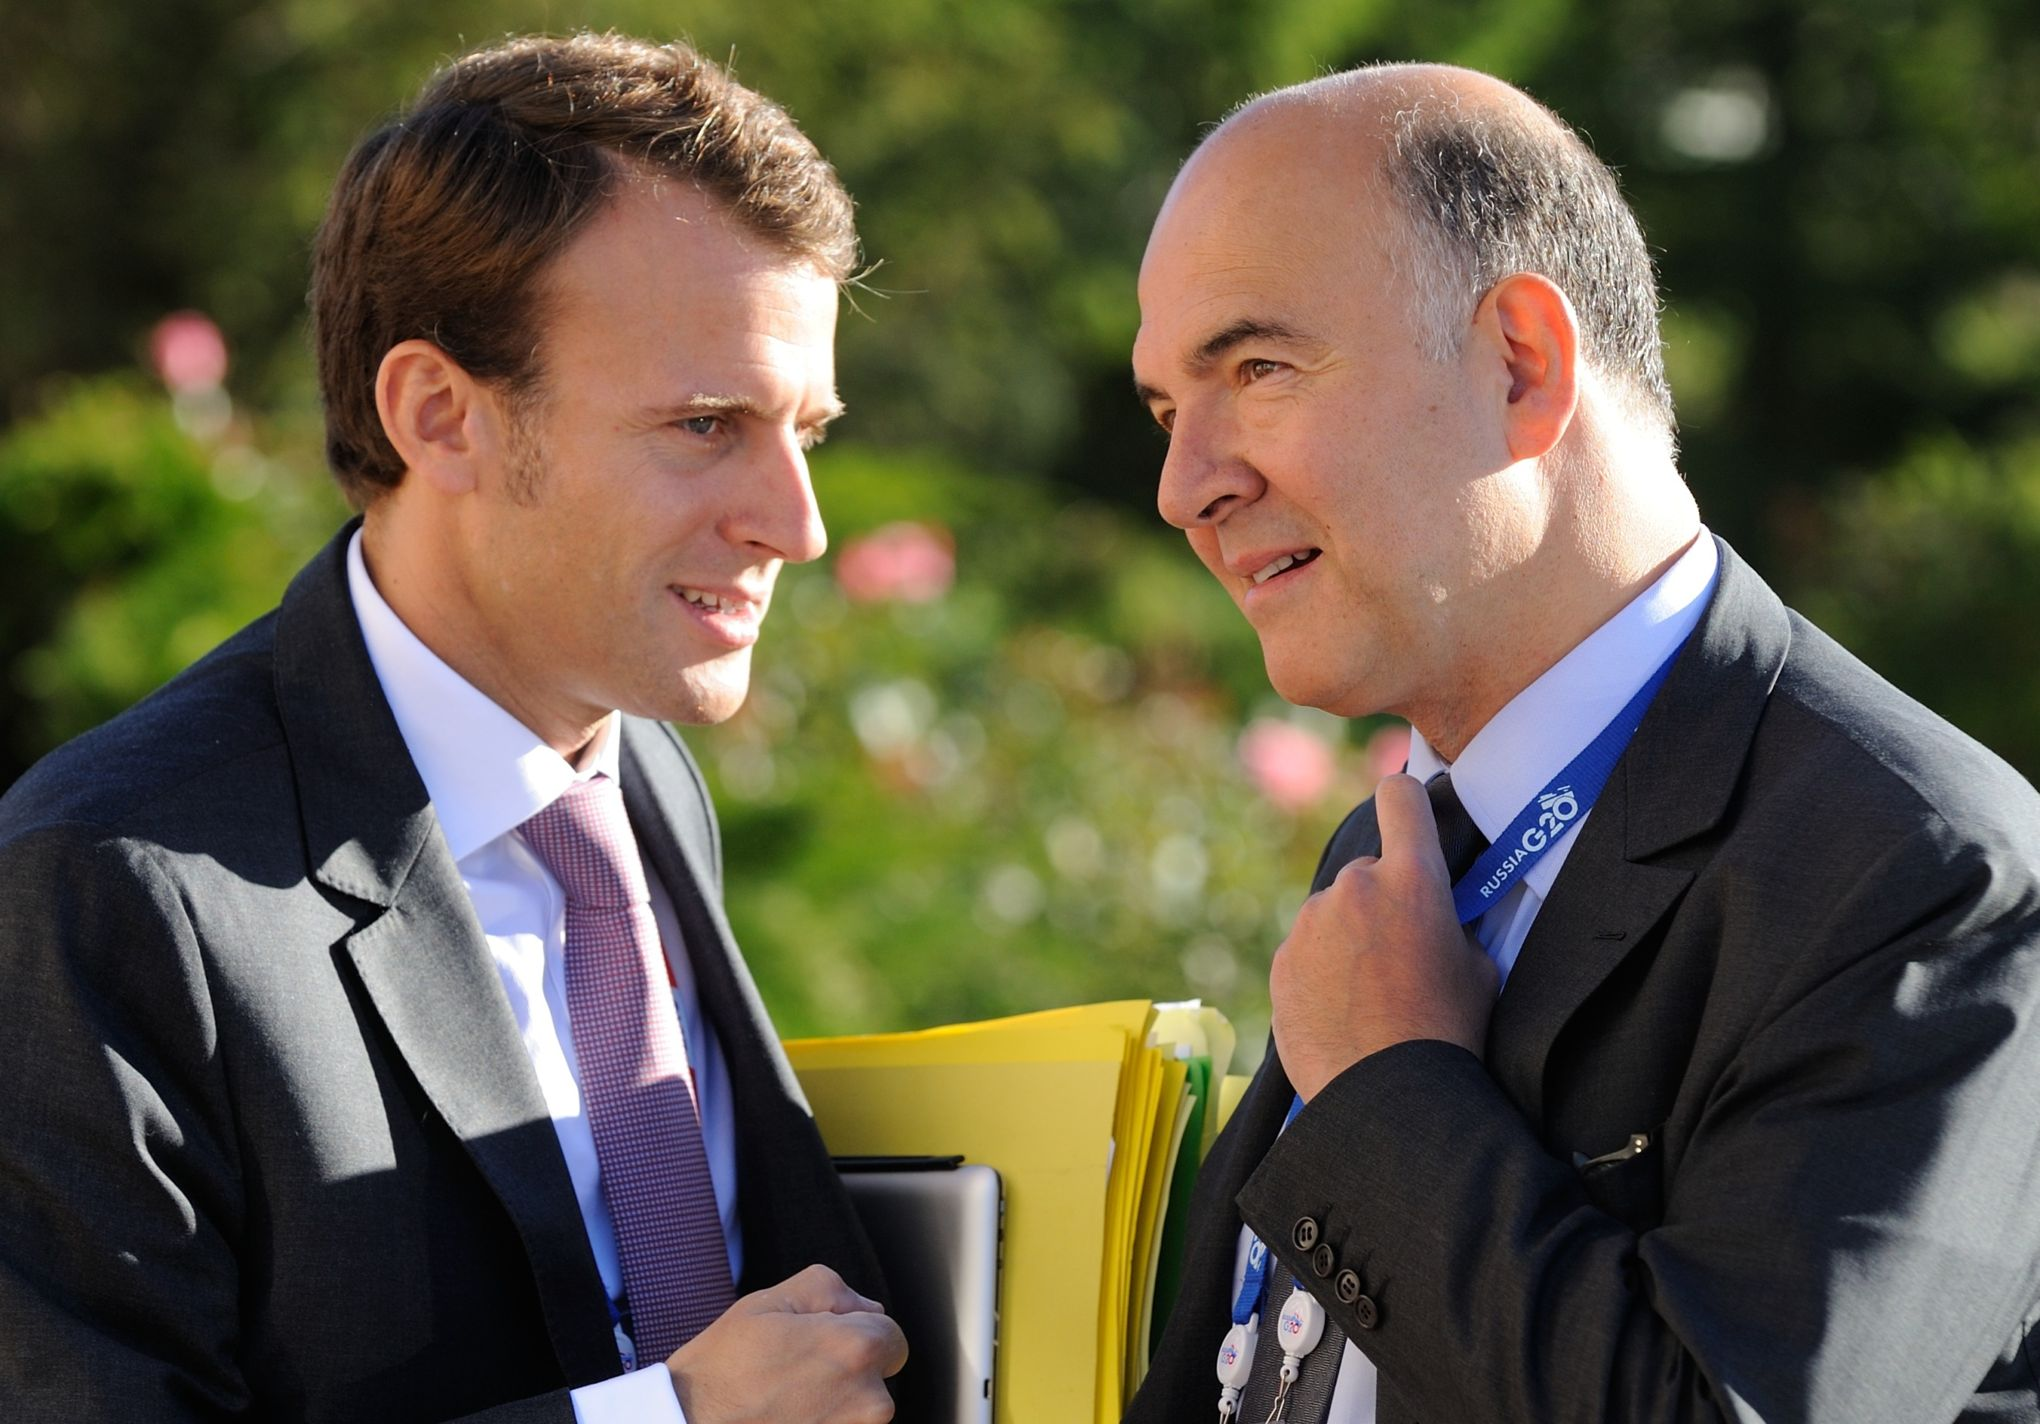 Qui est Emmanuel Macron ? - Page 19 XVMe398312c-eda8-11e8-8aea-f86a1150545d